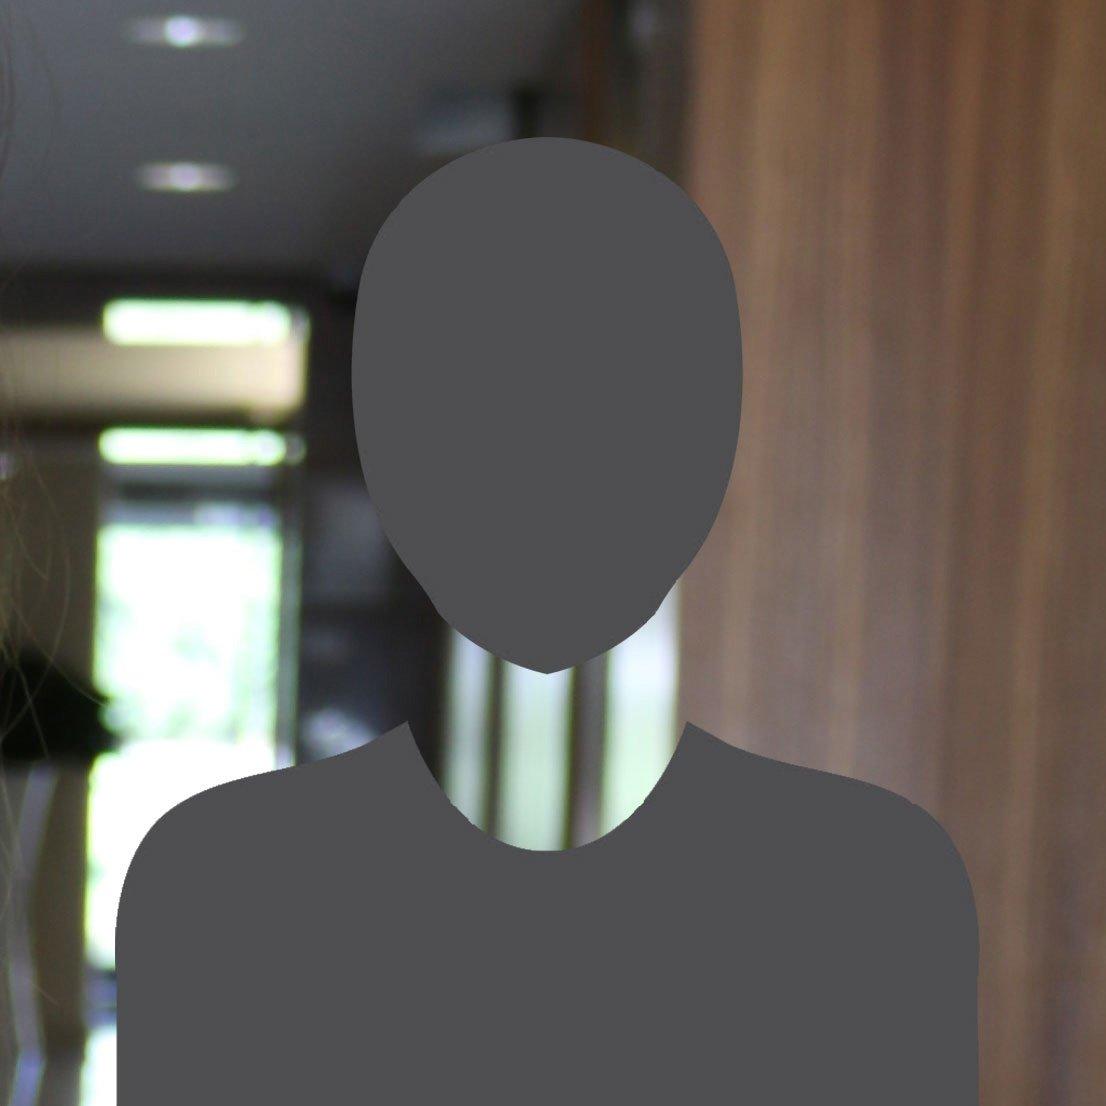 New Hire Headshot - Blank